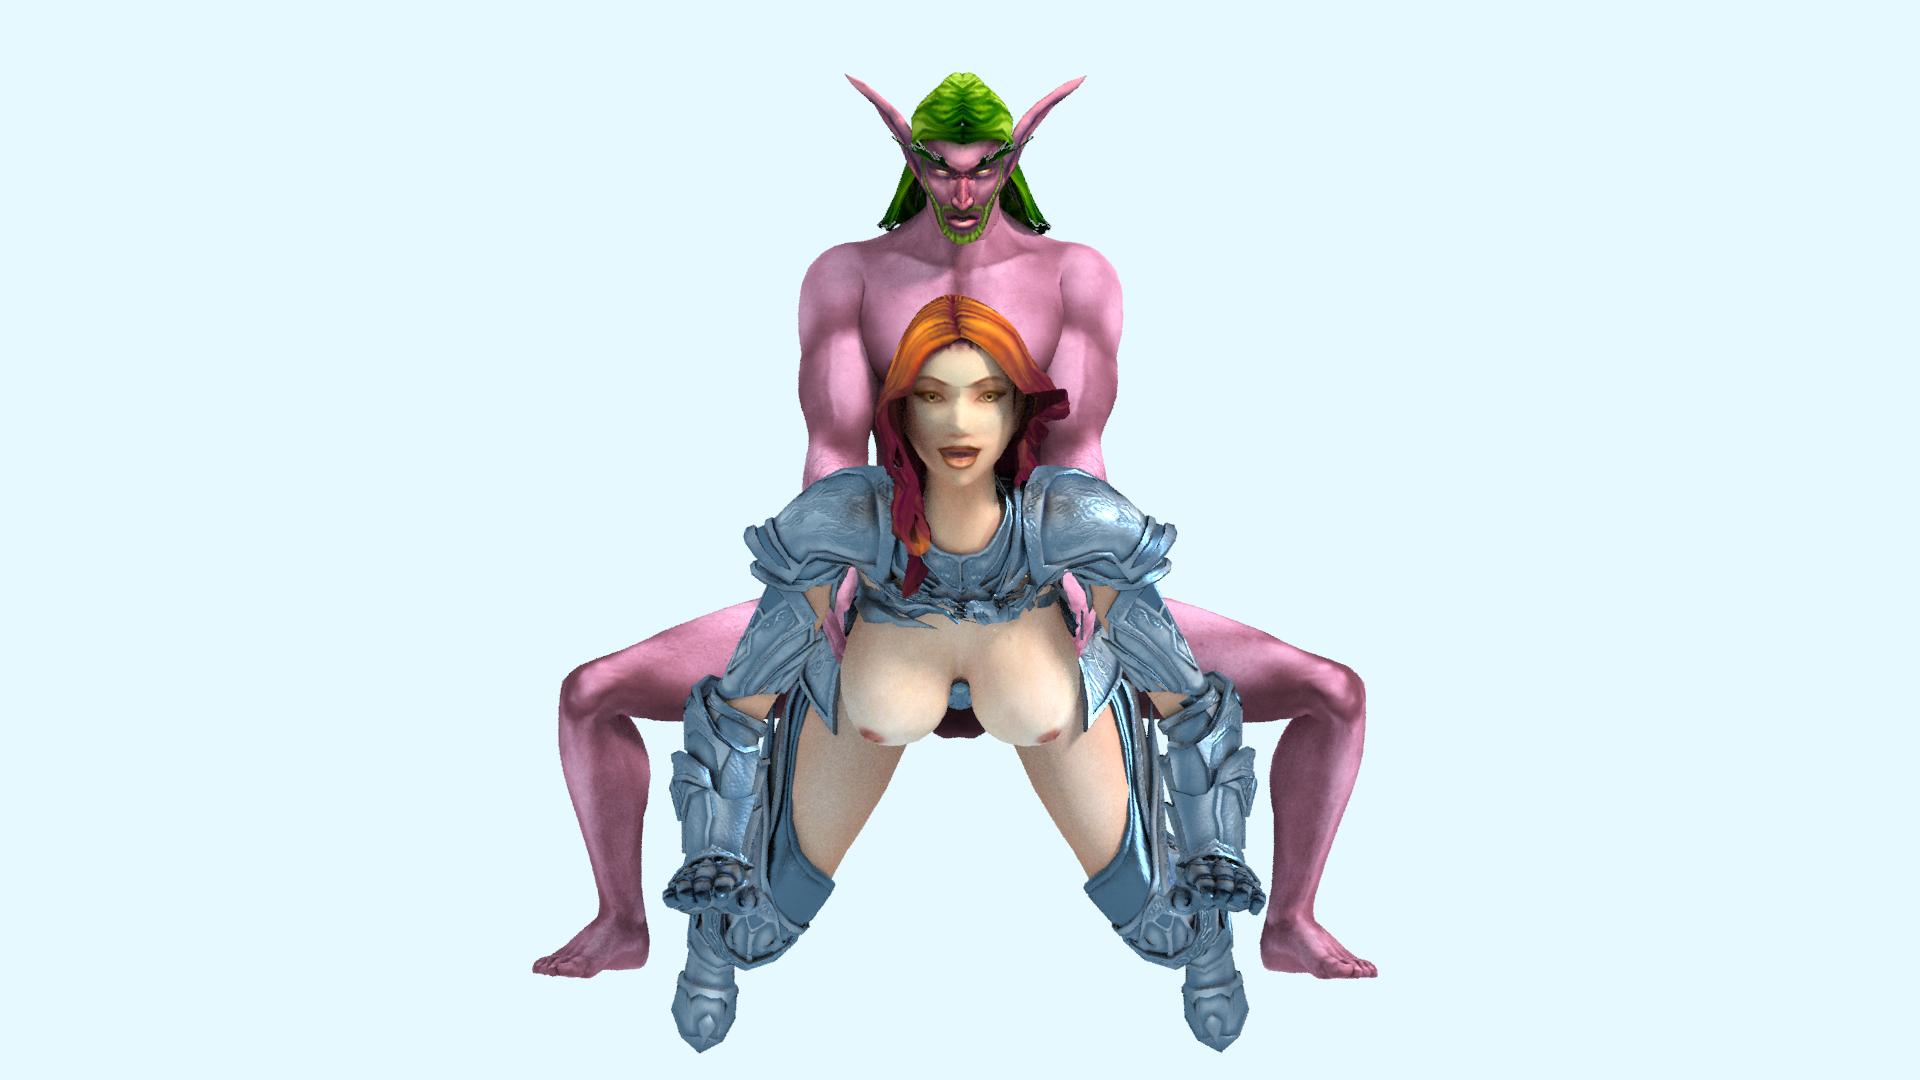 Gay chat emojis and same sex erotic emoticons